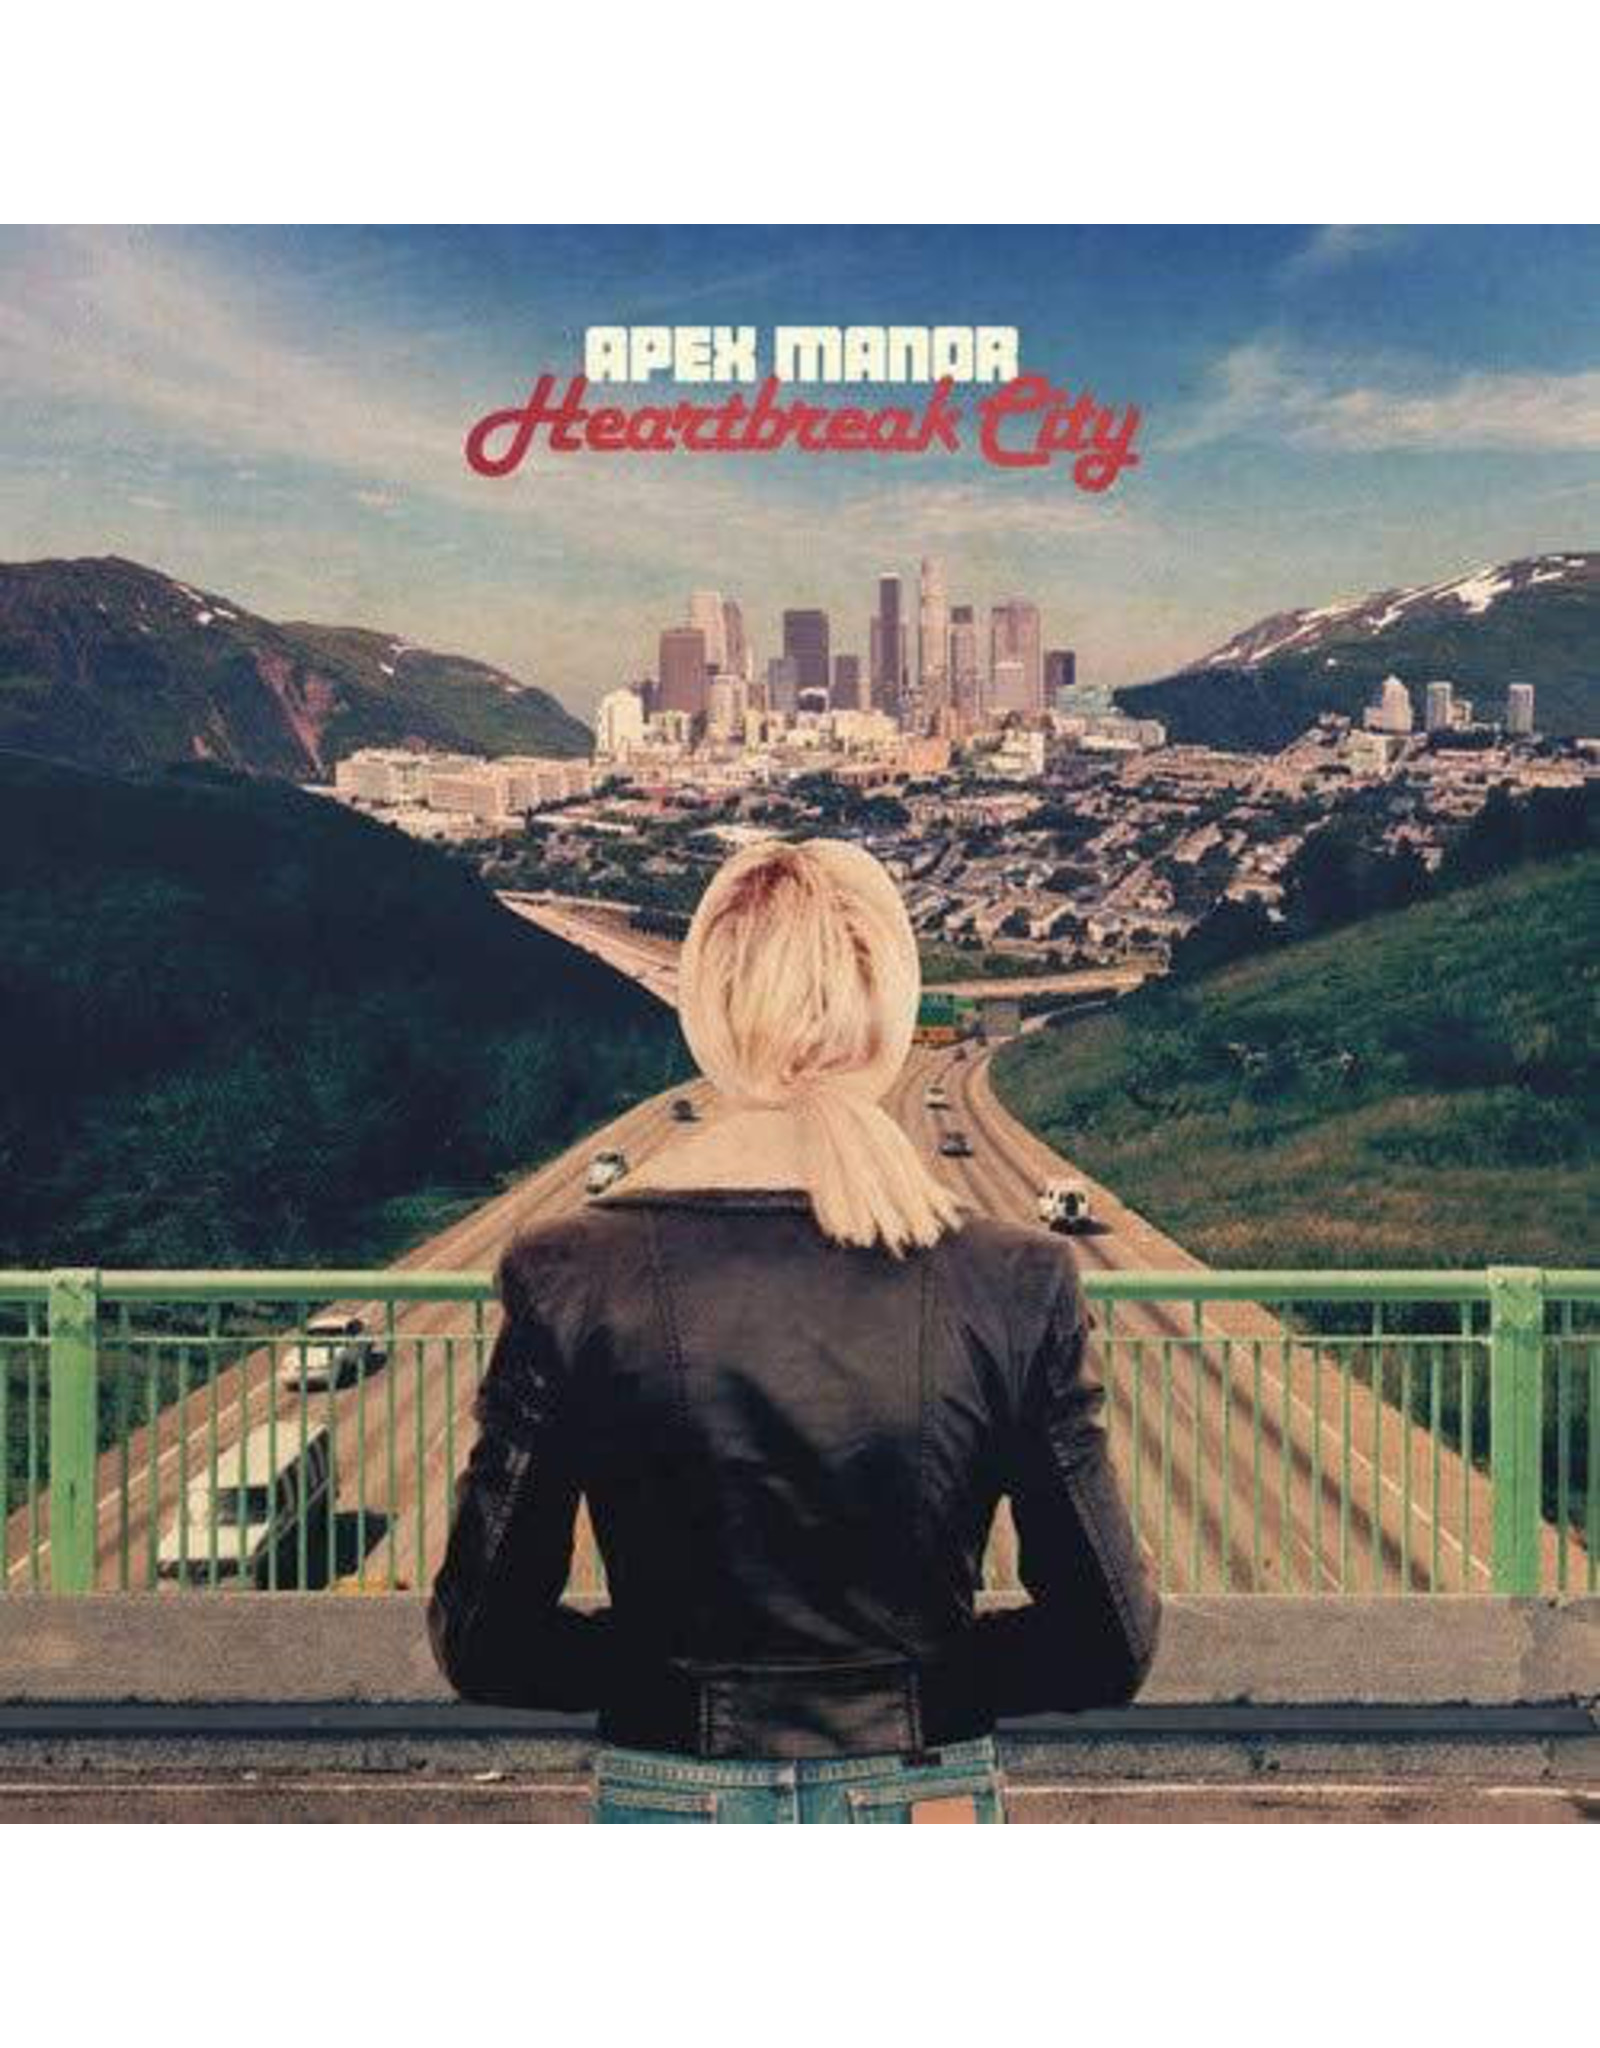 Apex Manor / Heartbreak City (Limited Edition Red Vinyl)